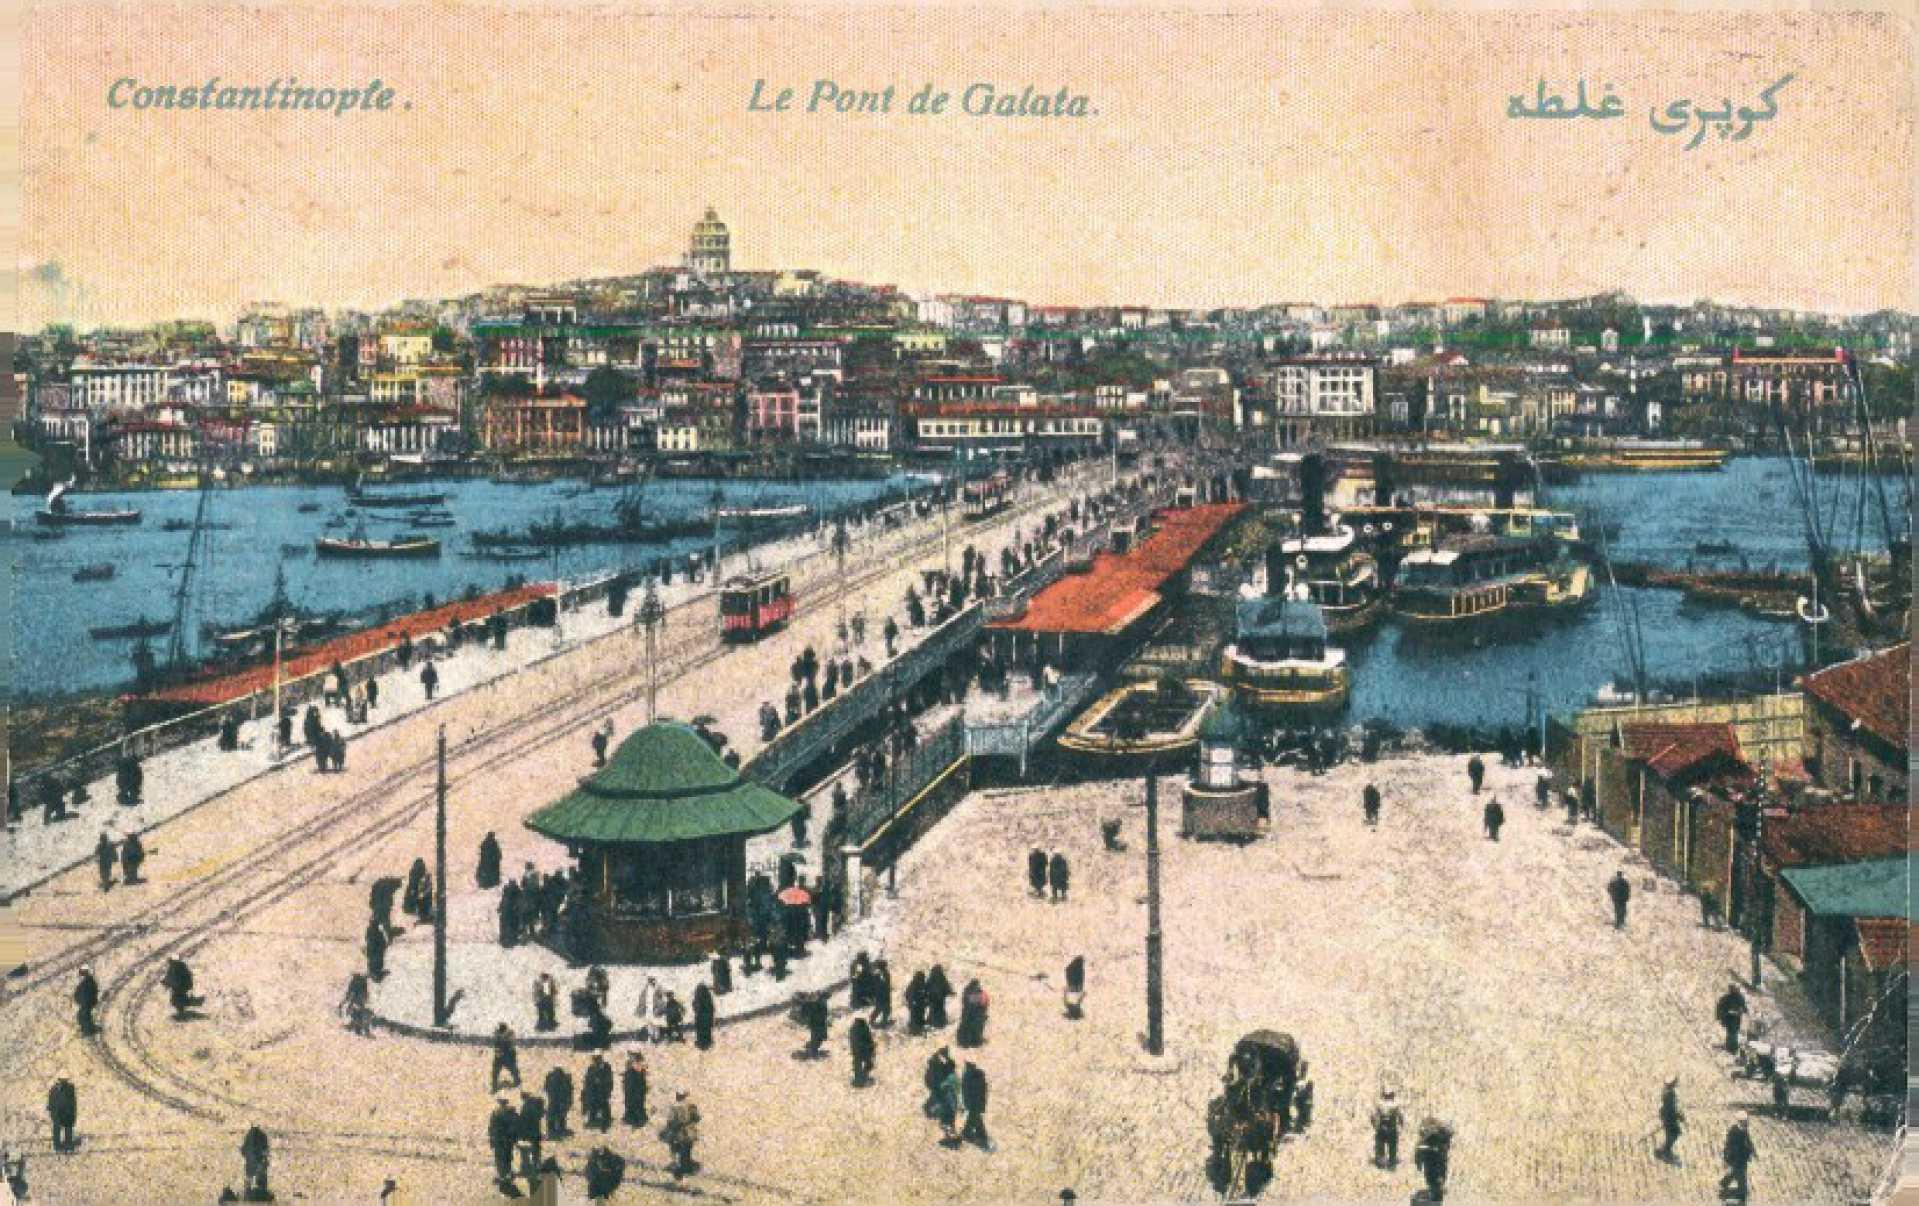 Costantinople. Le Pont de Galata